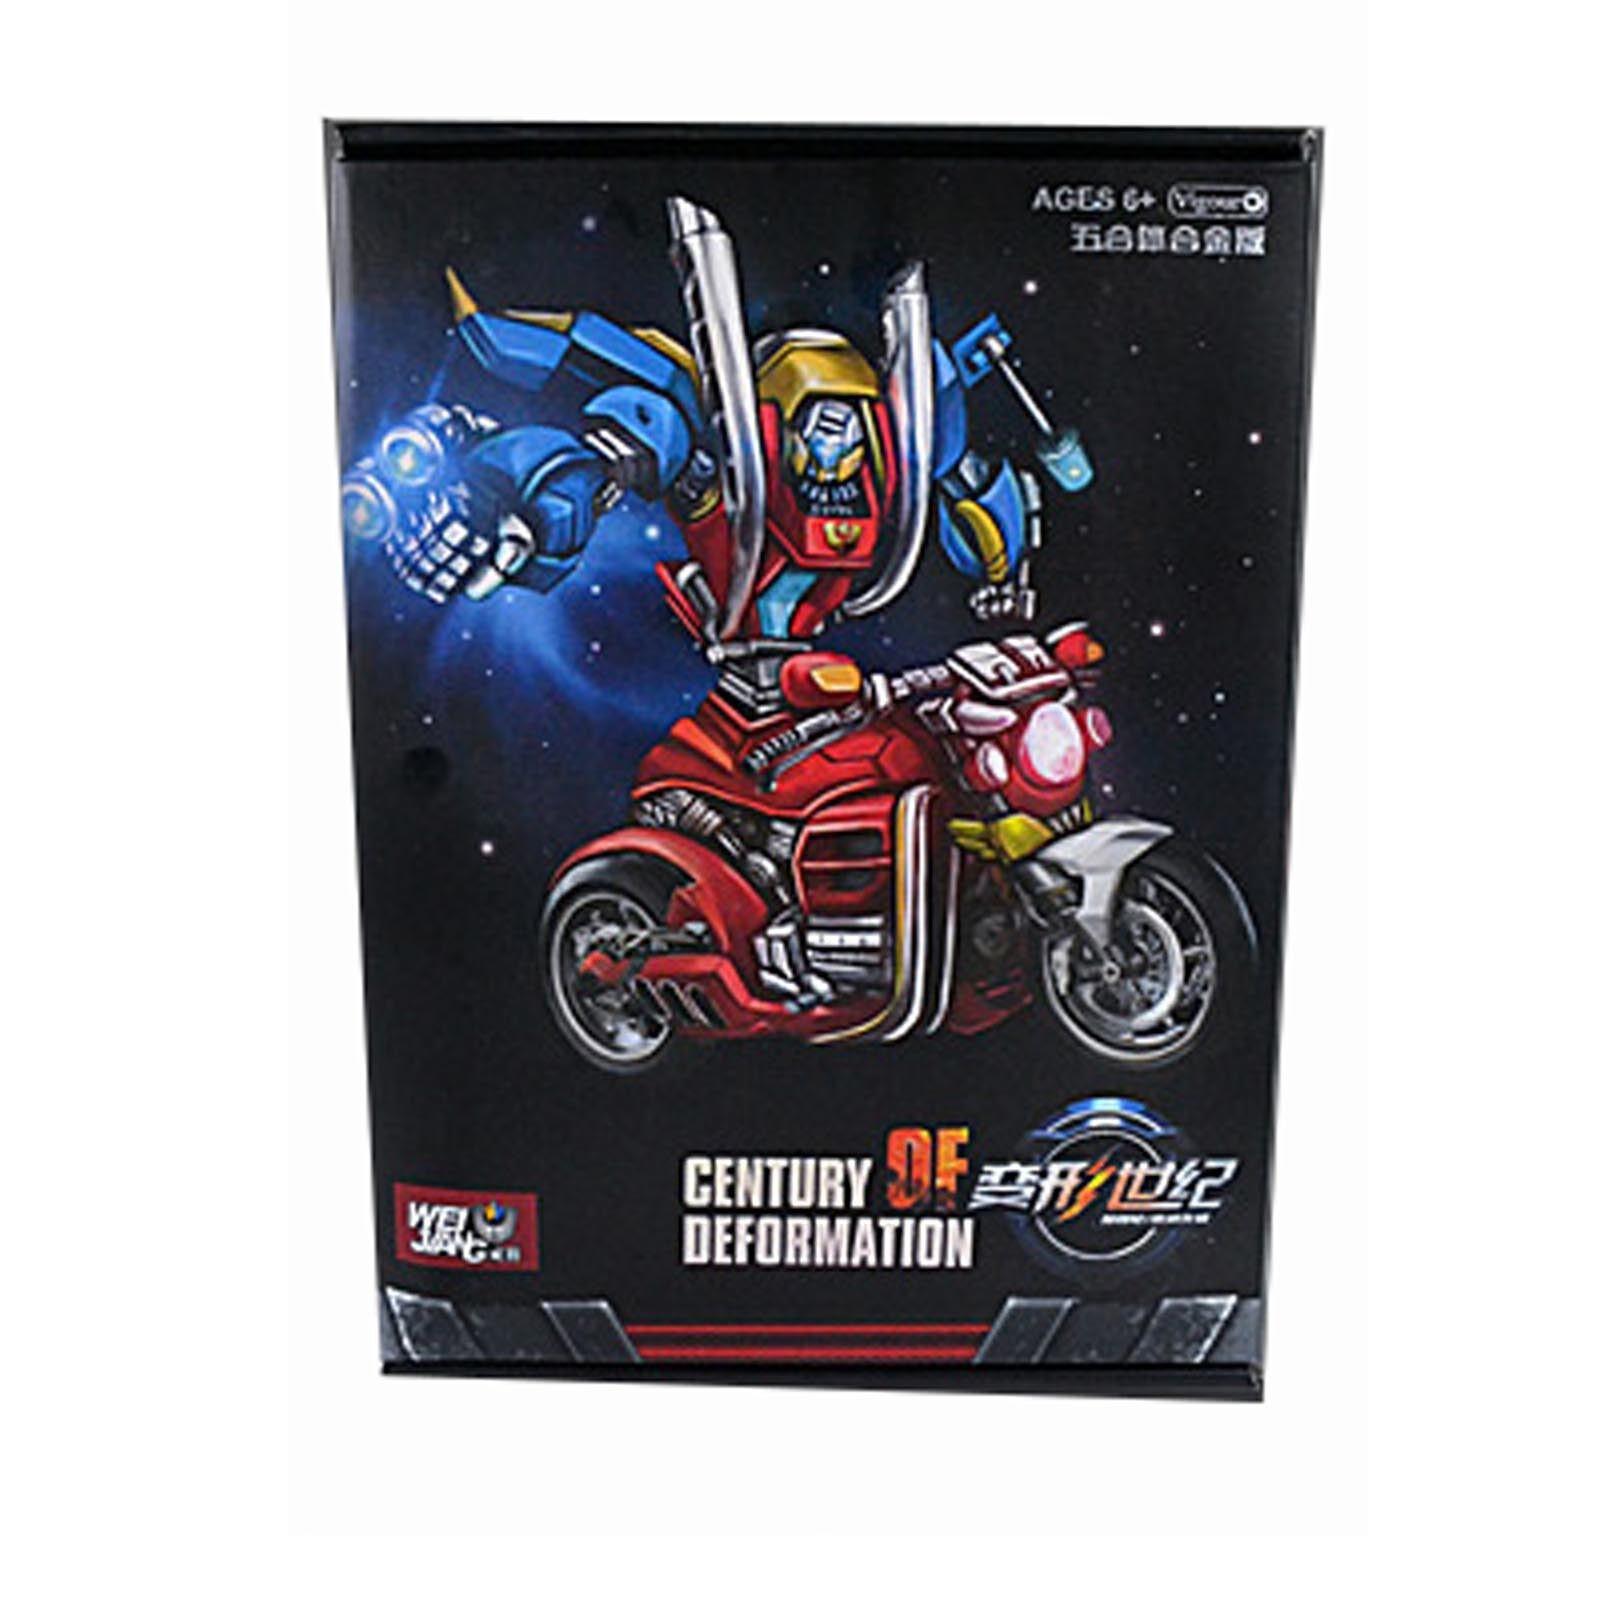 Transformers WJ WEIJIANG Century of deformation Motorbike Action Figure Cars New